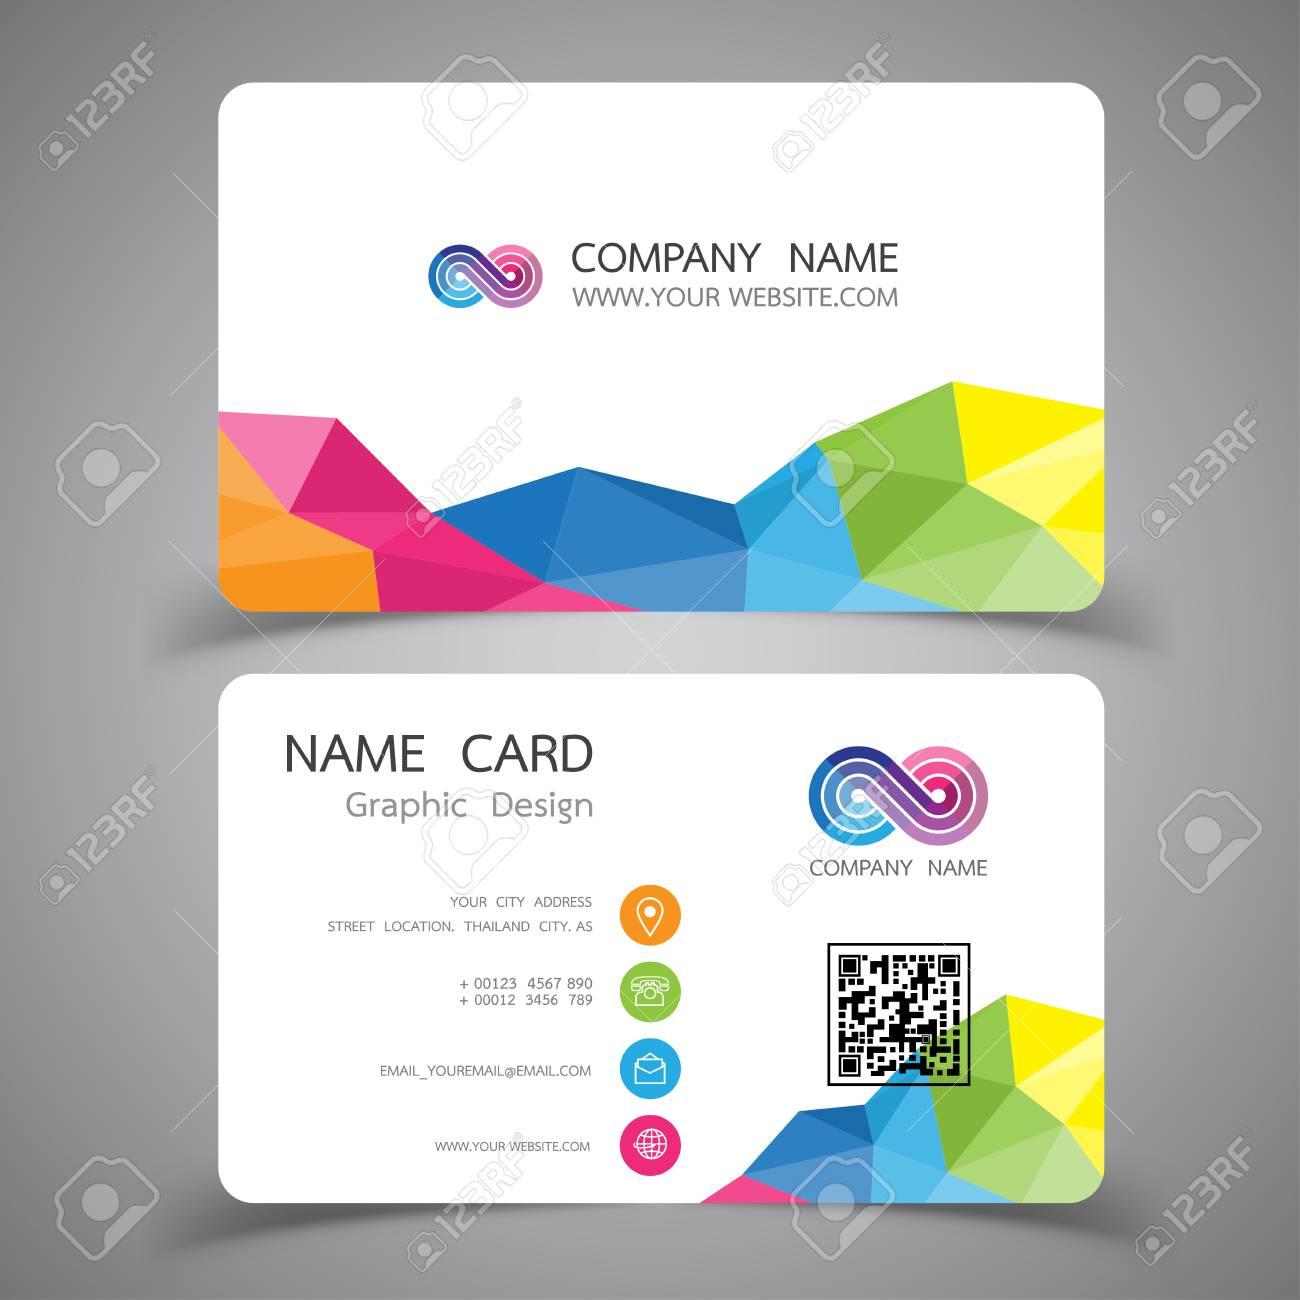 Business Card Design Set, Modern Creative Business Card Template In Web Design Business Cards Templates